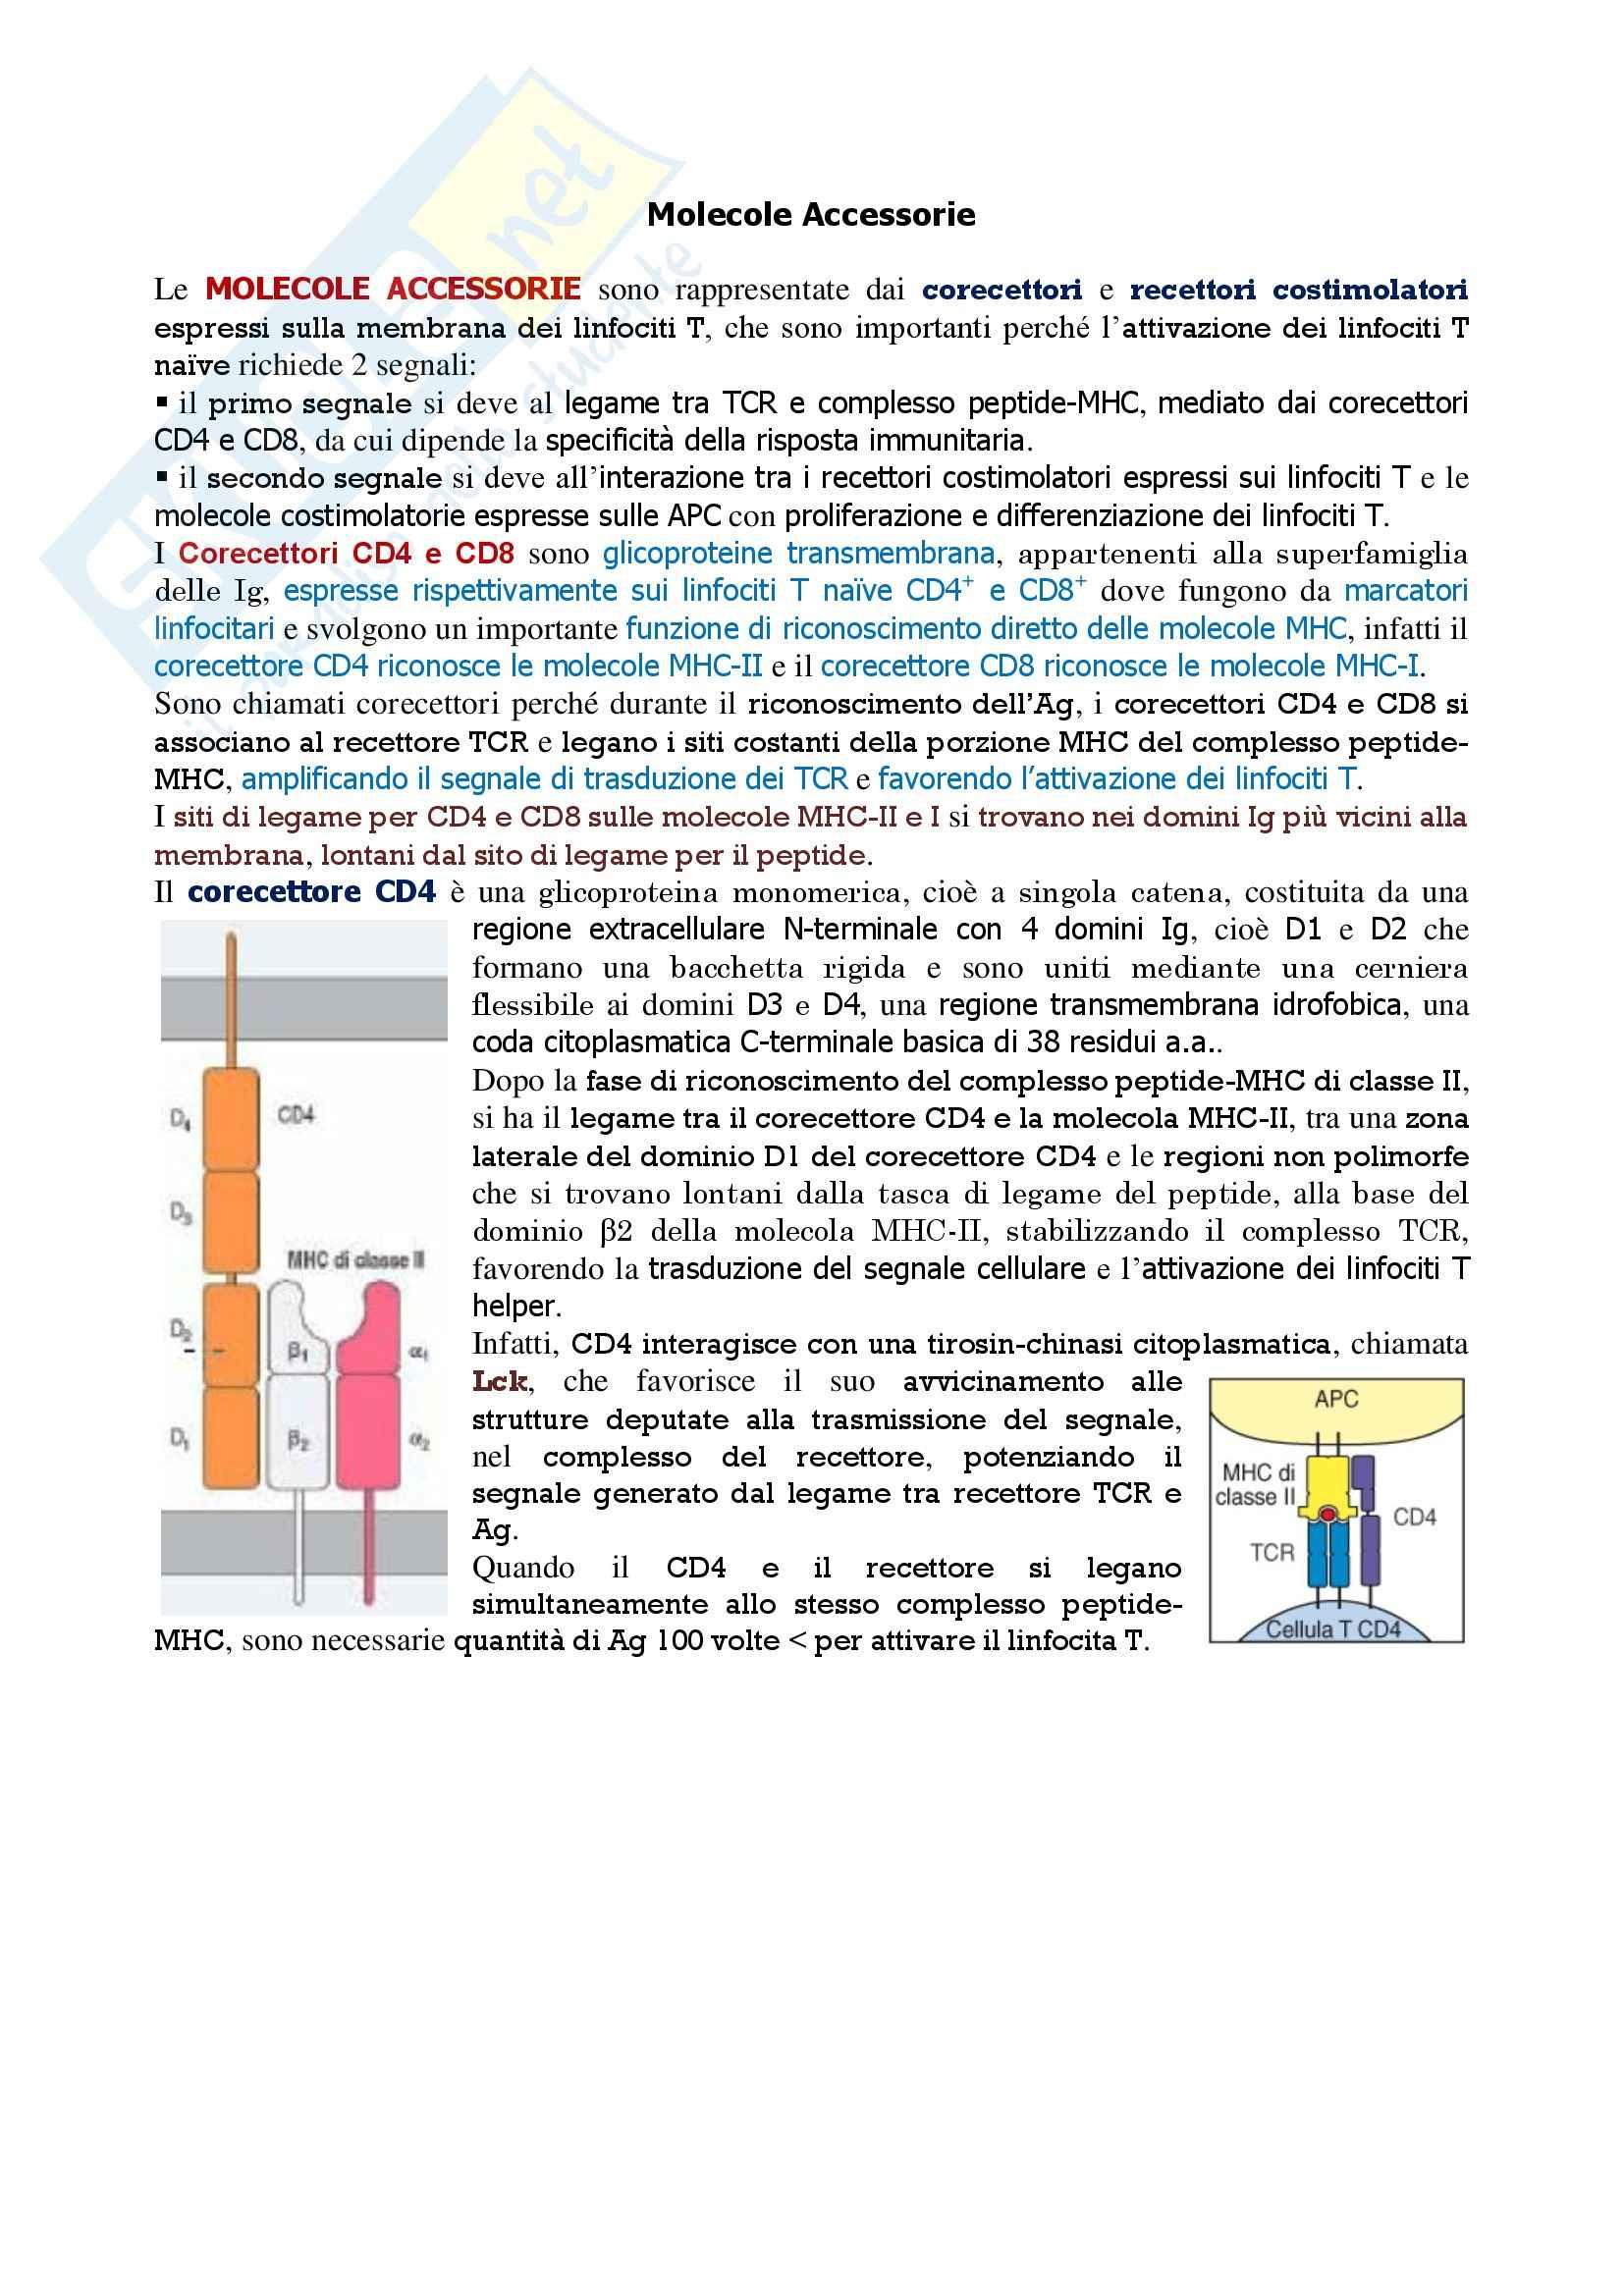 Immunologia - molecole accessorie